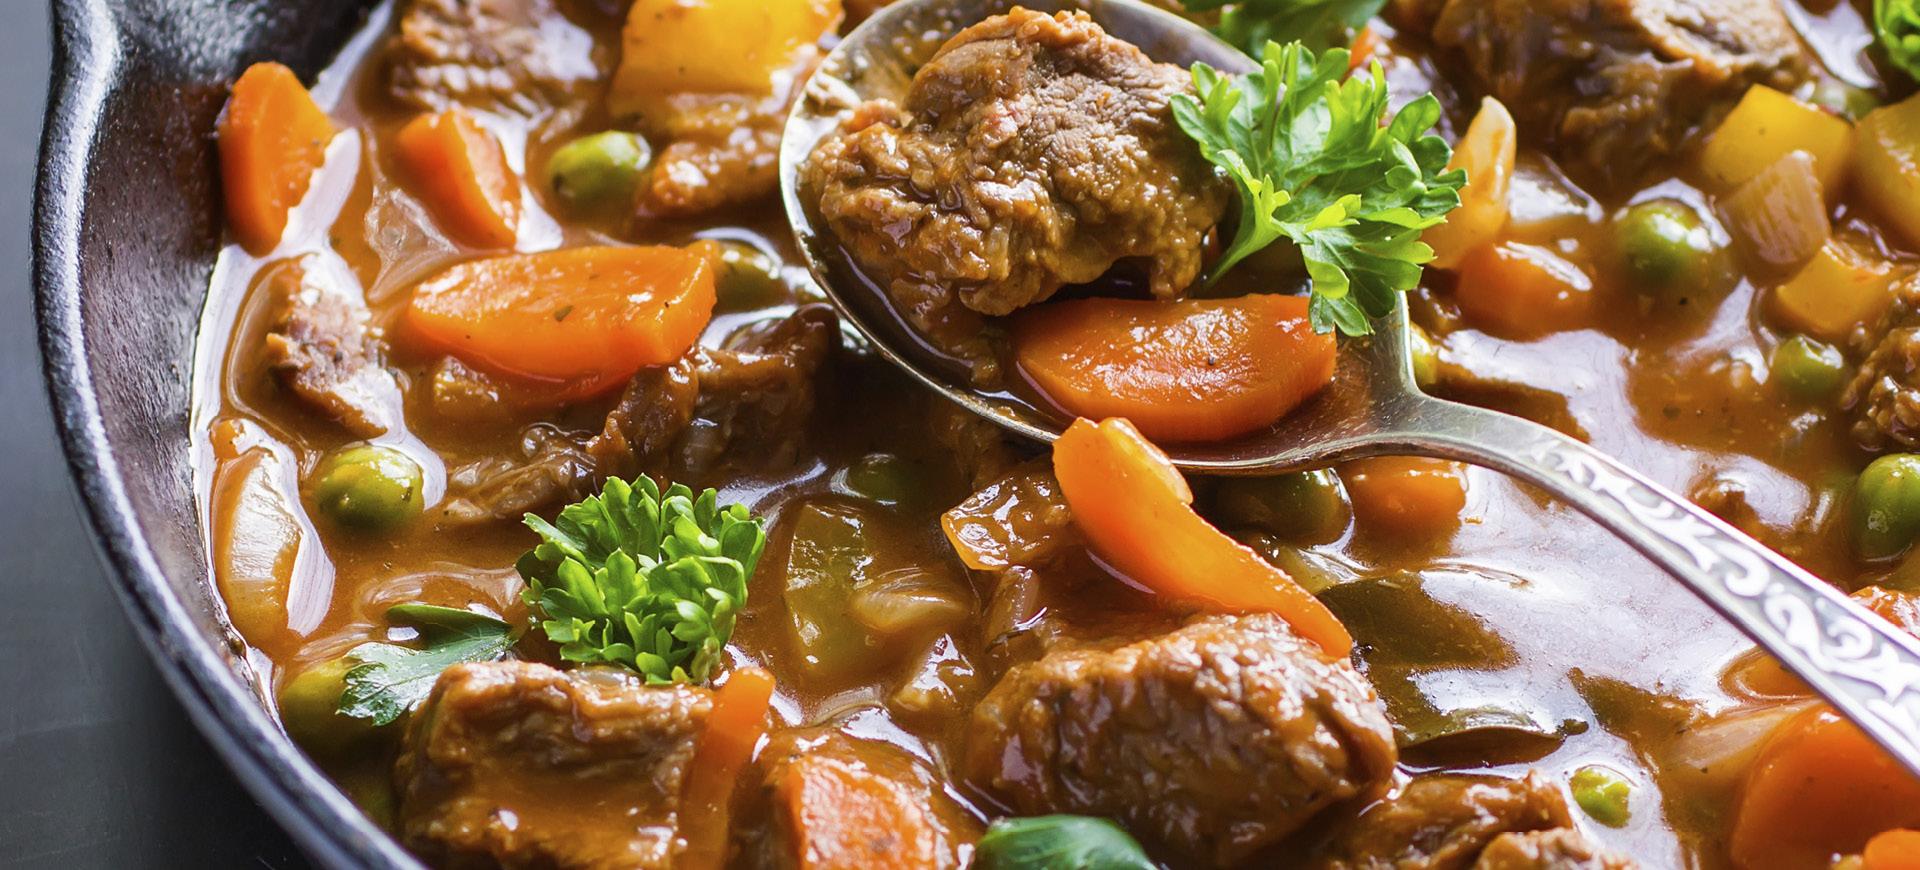 banner Irish slow cooker beef stew